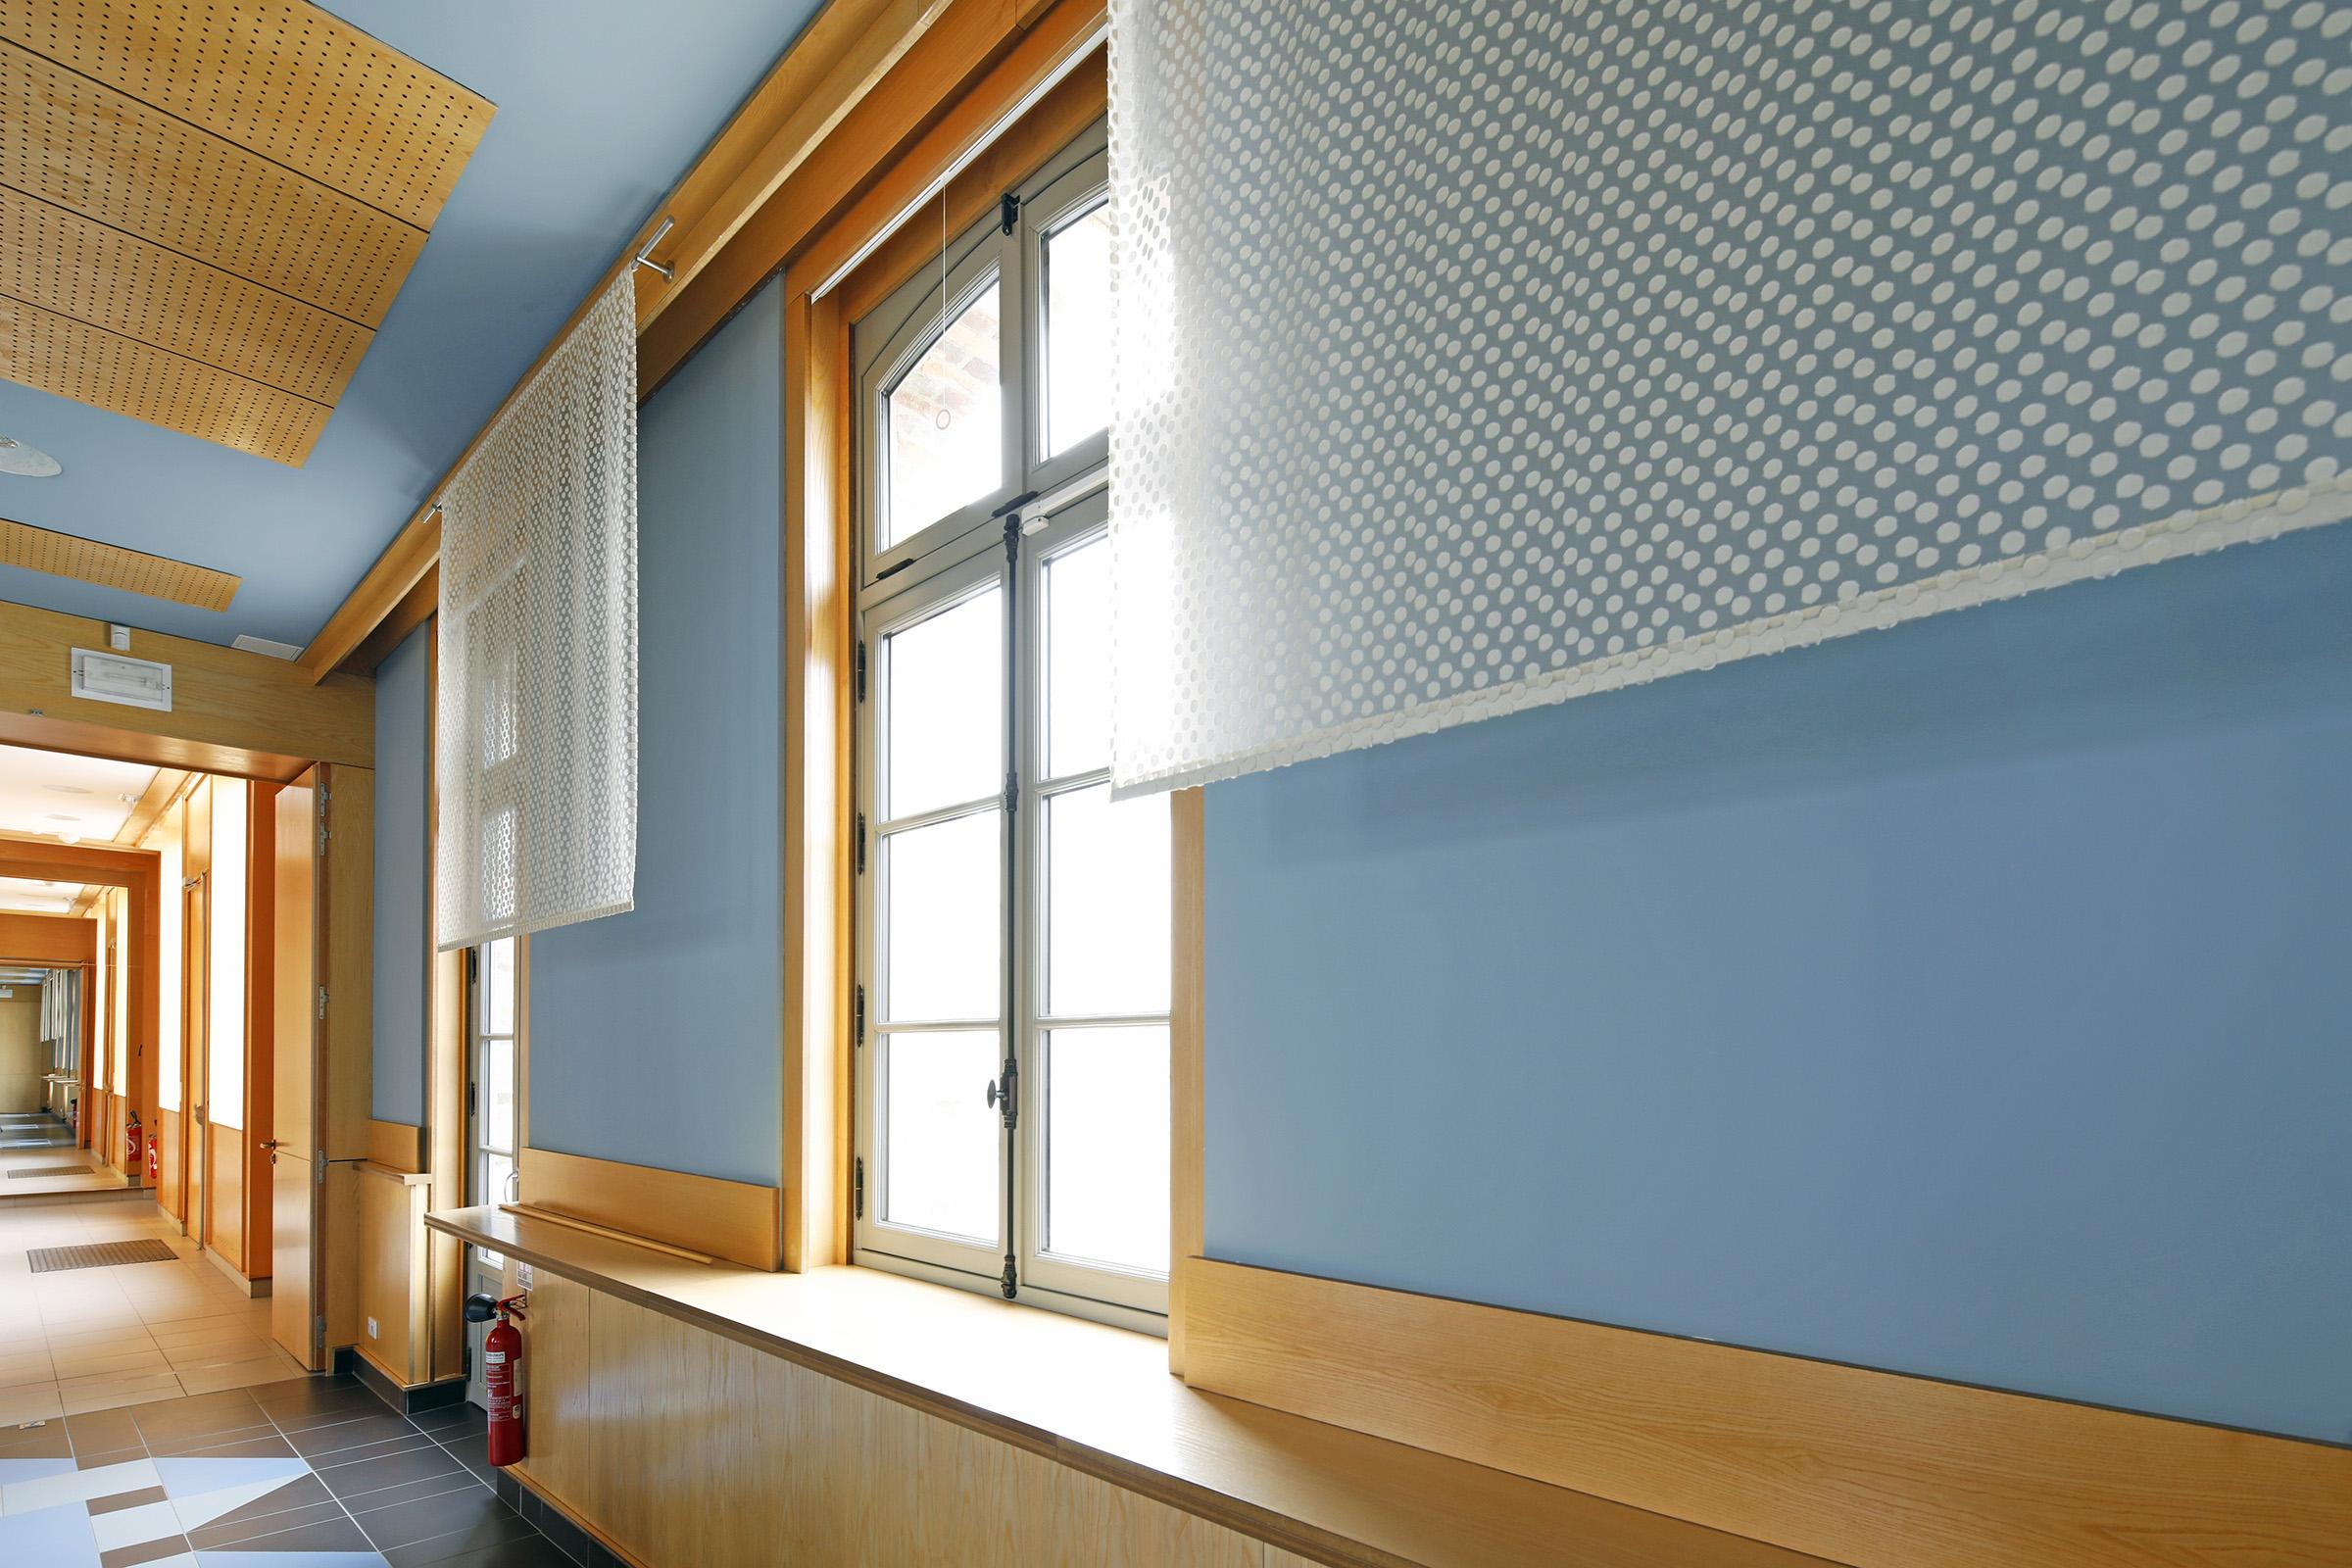 Amilly - La Maison Saint Loup - Interieur - Sylvain Dubuisson 027.jpg